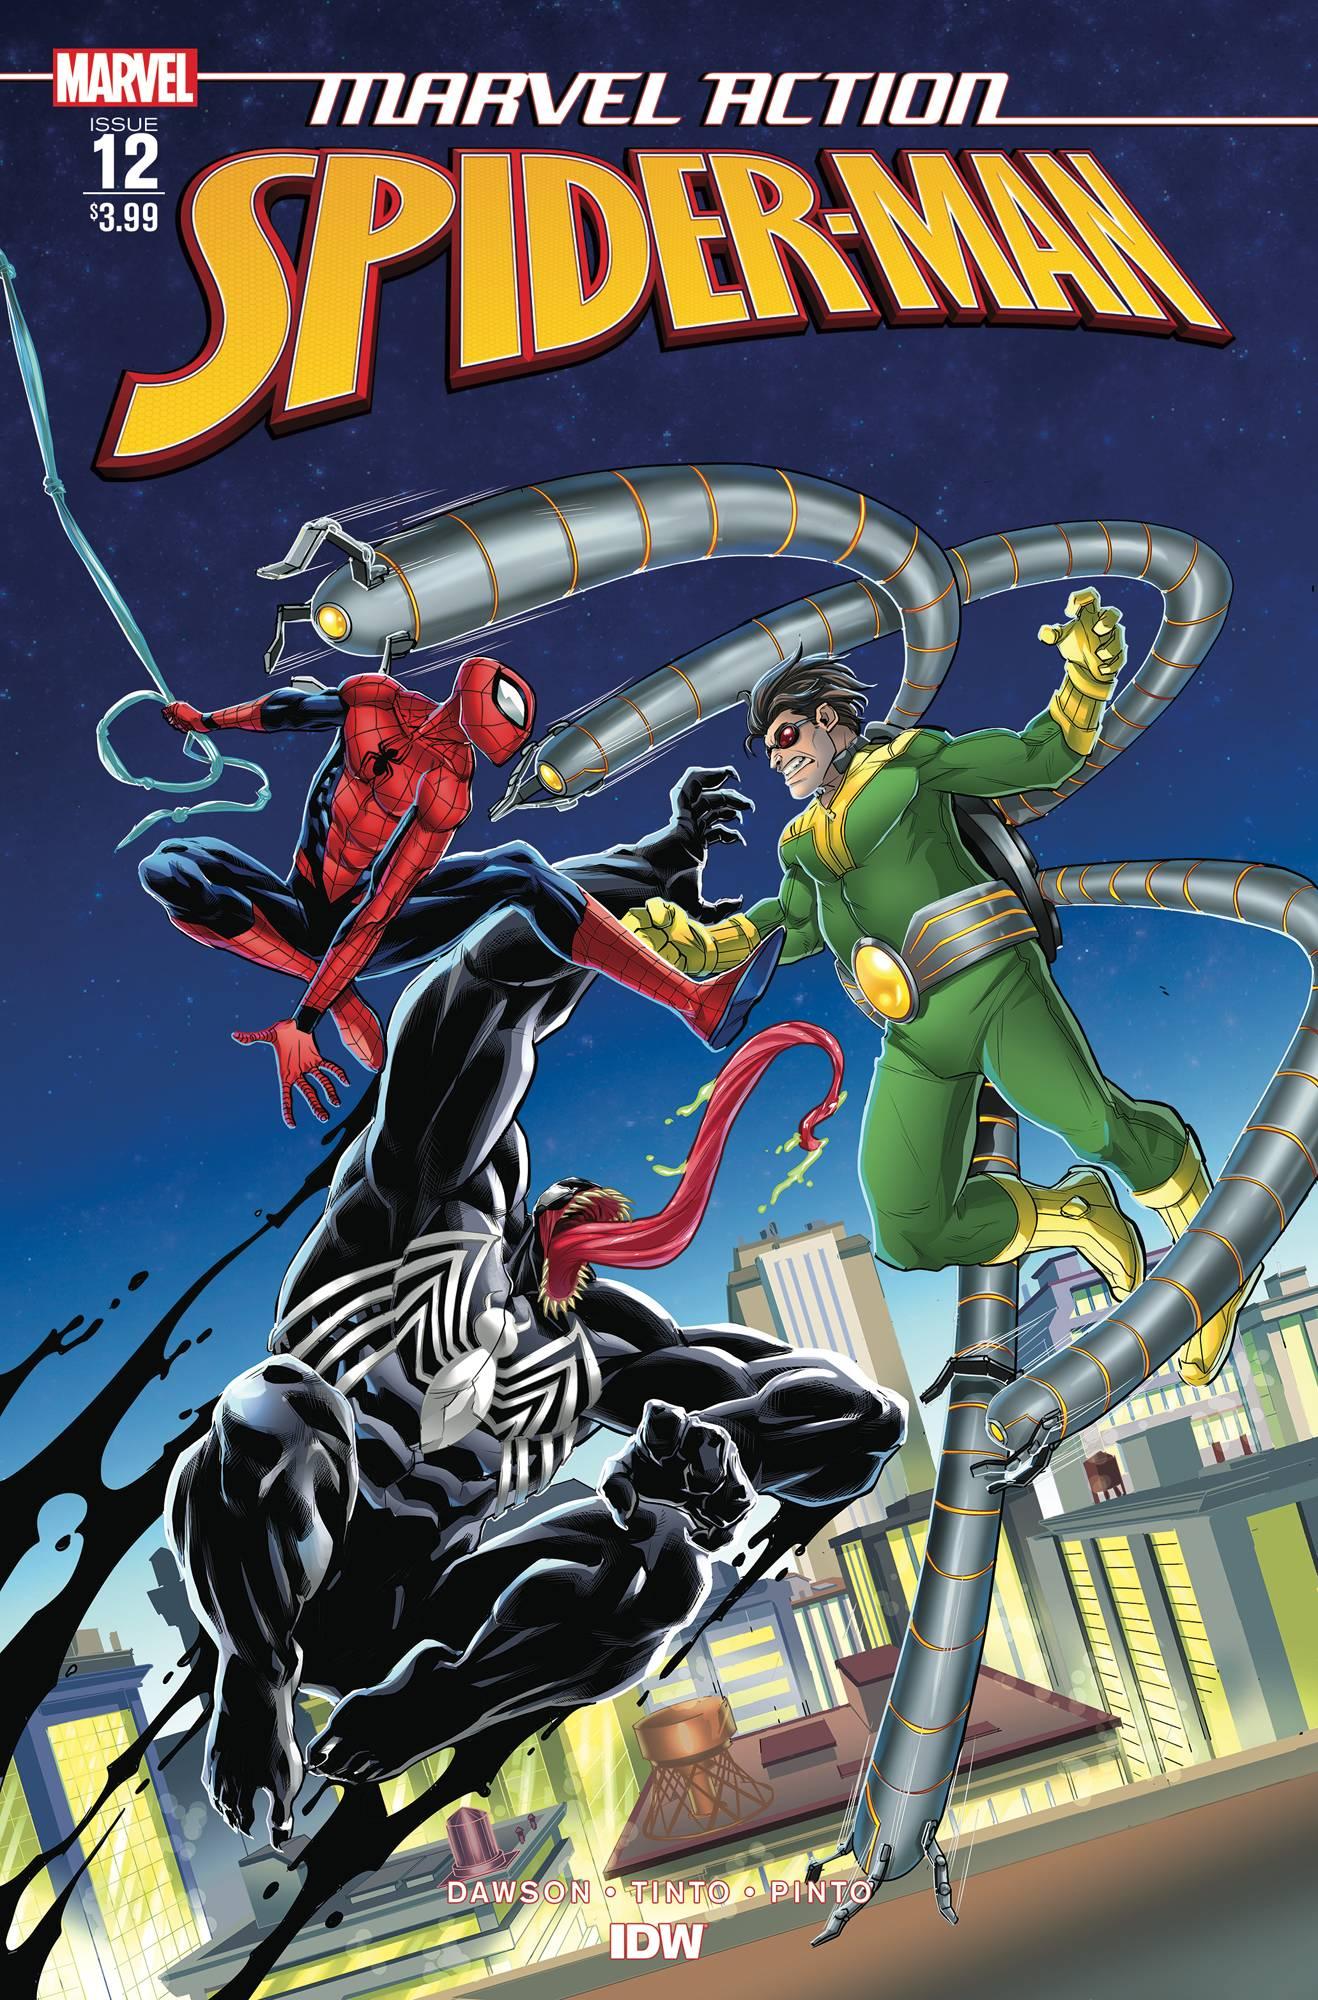 Marvel Action Spider-Man (IDW) #12 (2019)